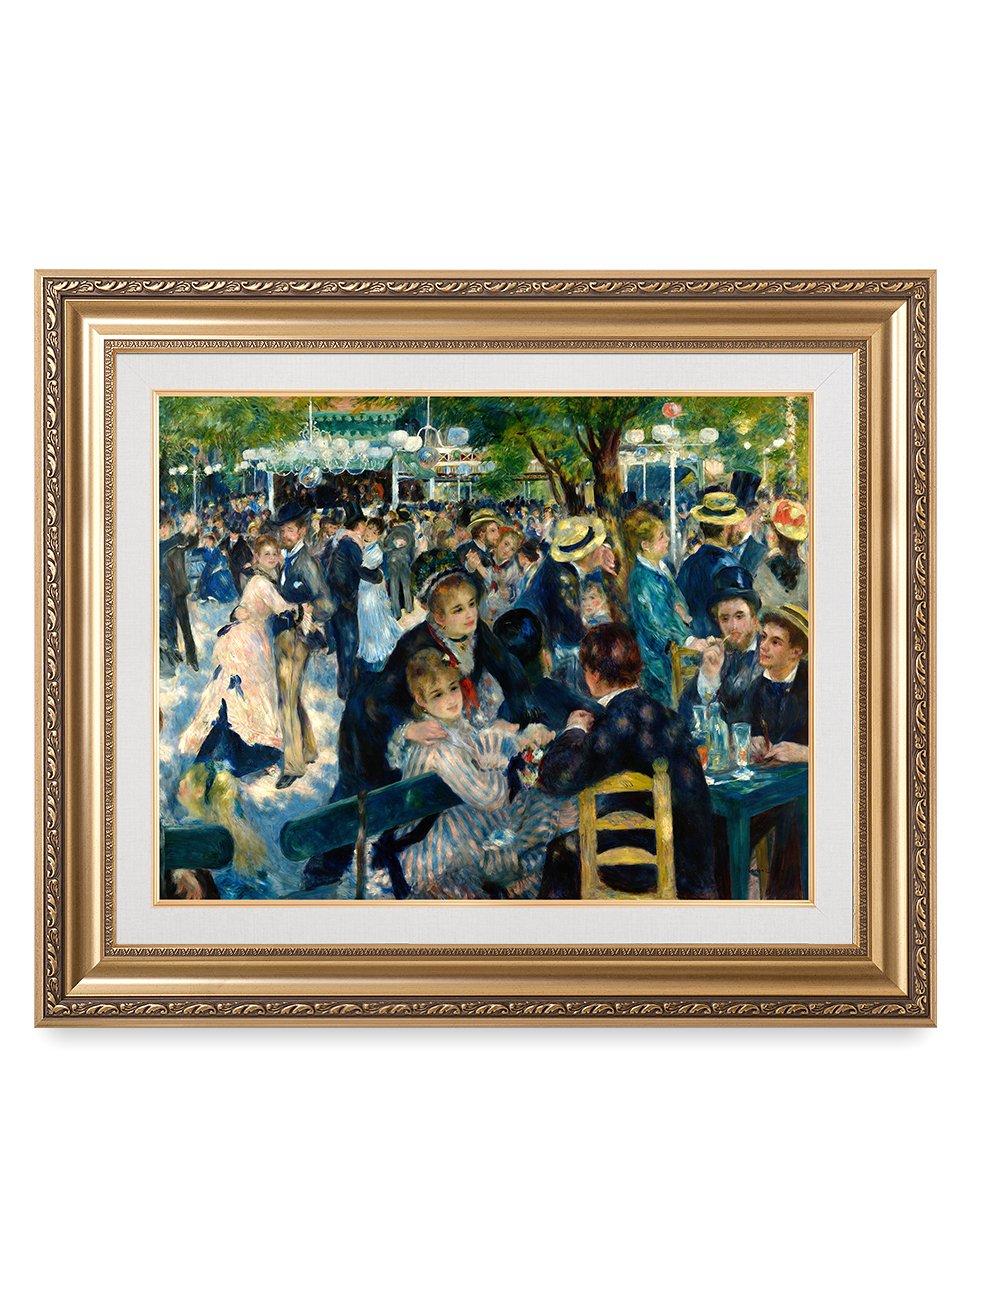 DecorArts - Bal du moulin de la Galette, Pierre-Auguste Renoir Classic Art. Giclee Prints Framed Art for Wall Decor. Framed size: 36x30''